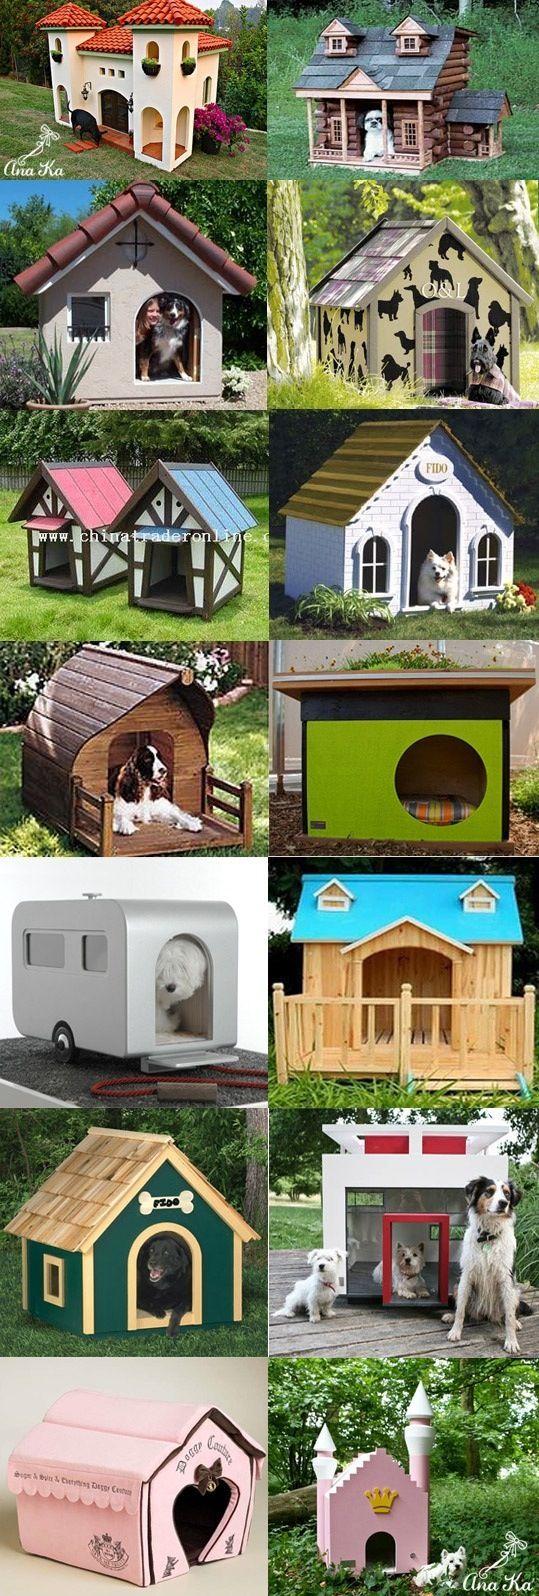 Awesome dog houses